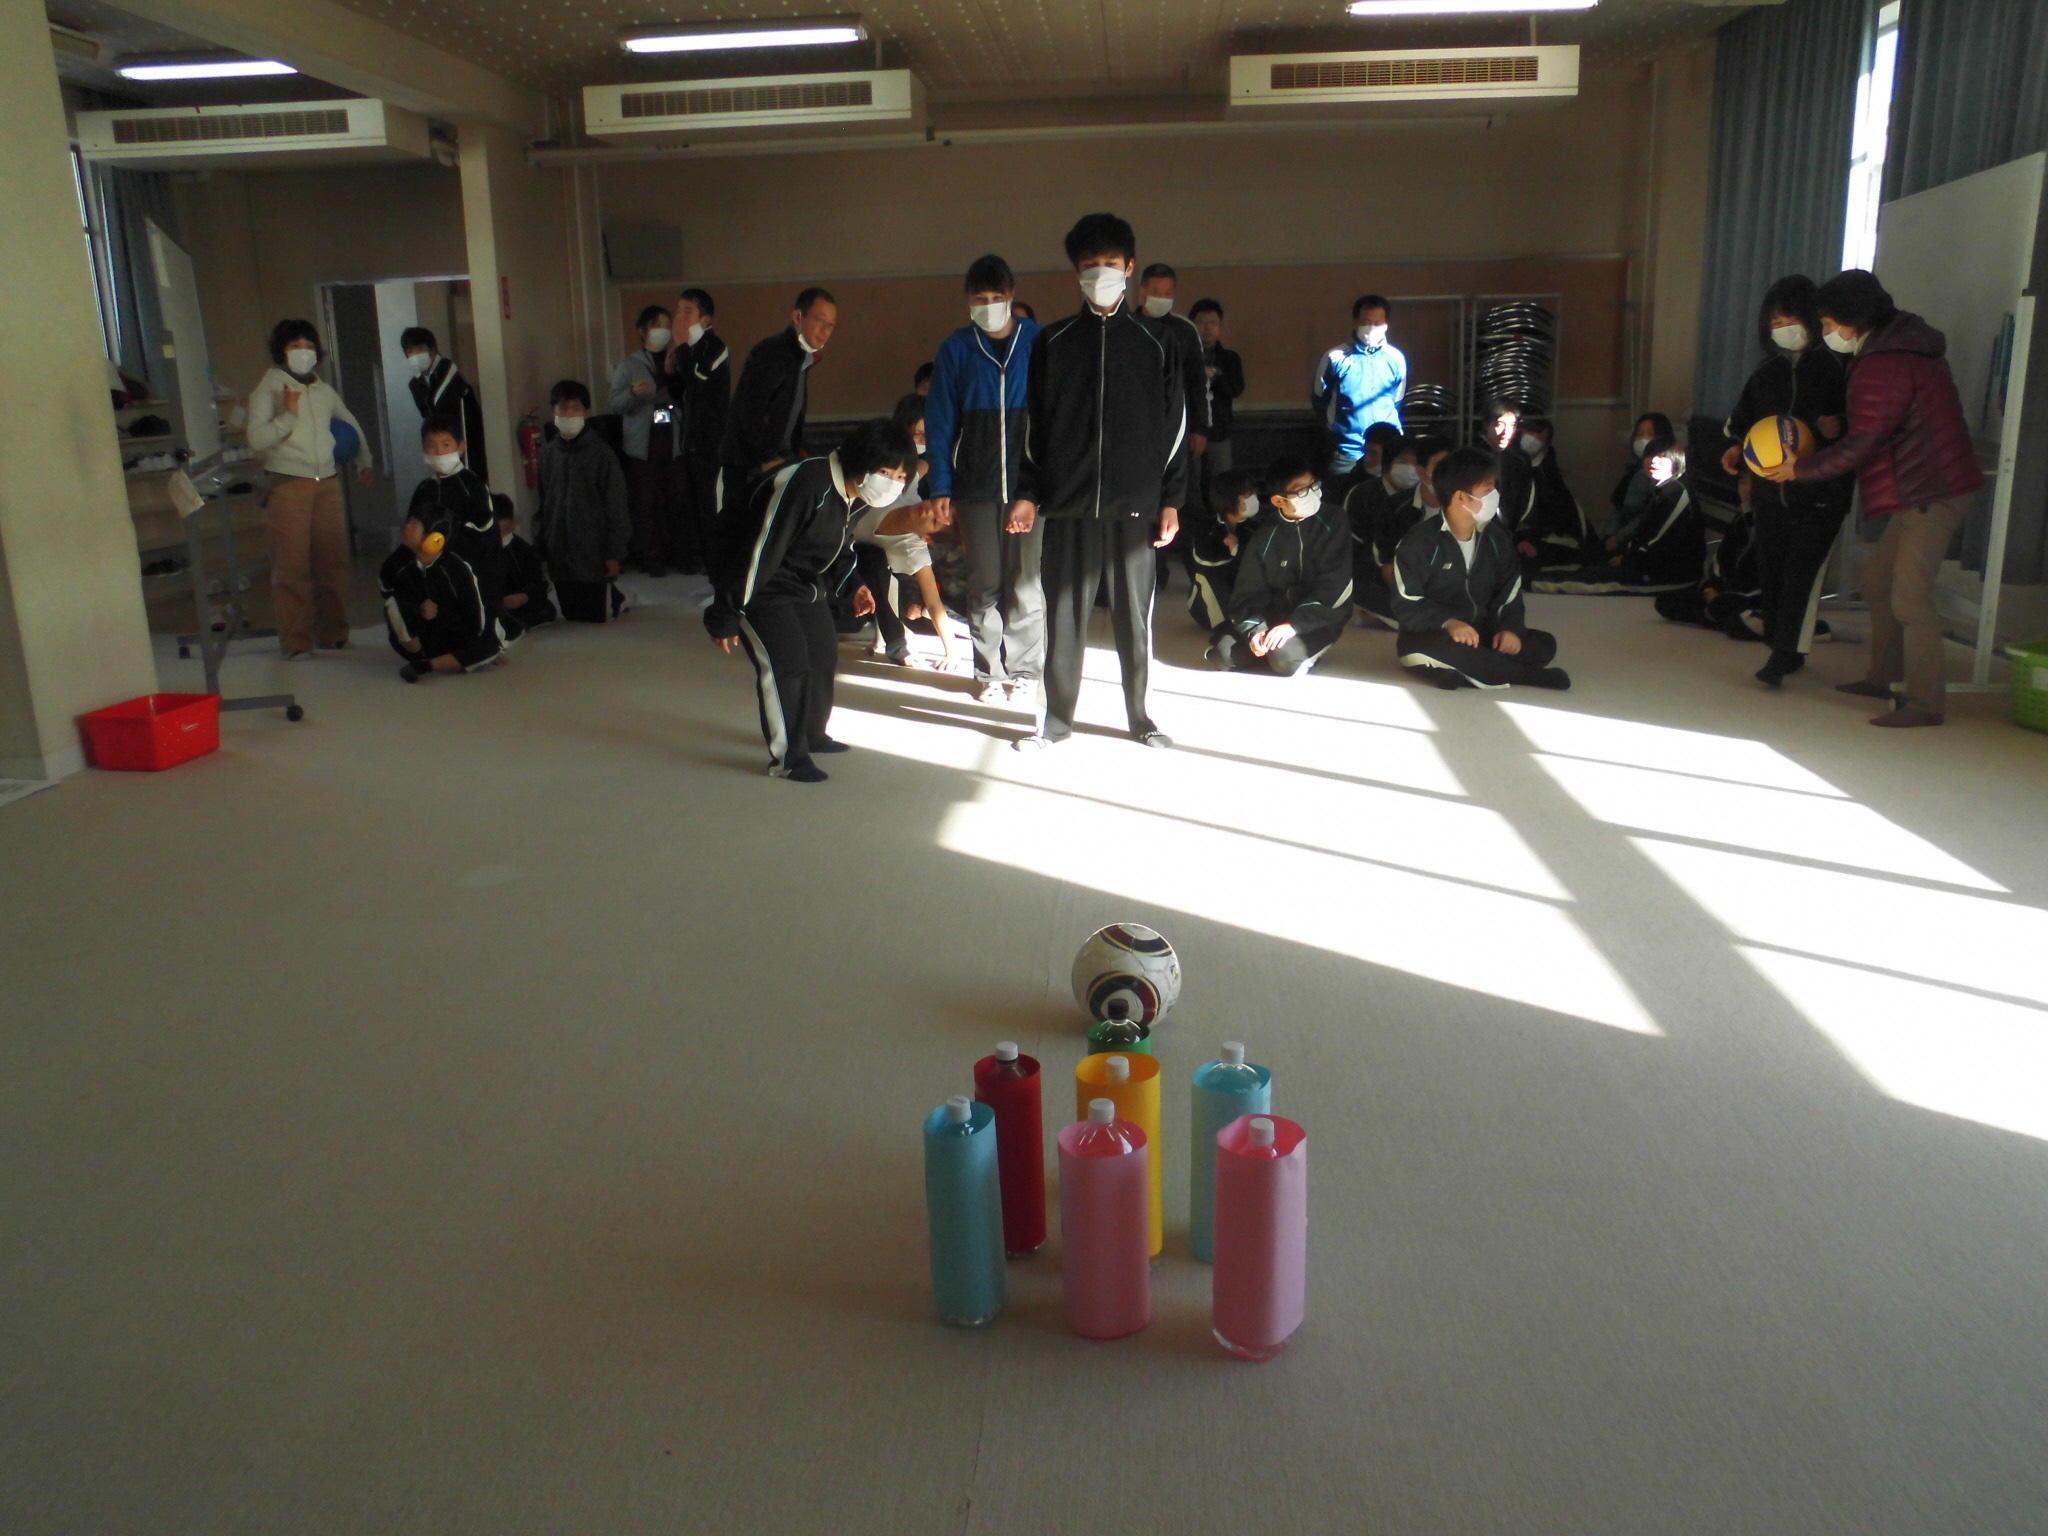 http://www.shimanet.ed.jp/hamadayougo/news/CIMG7683.JPG